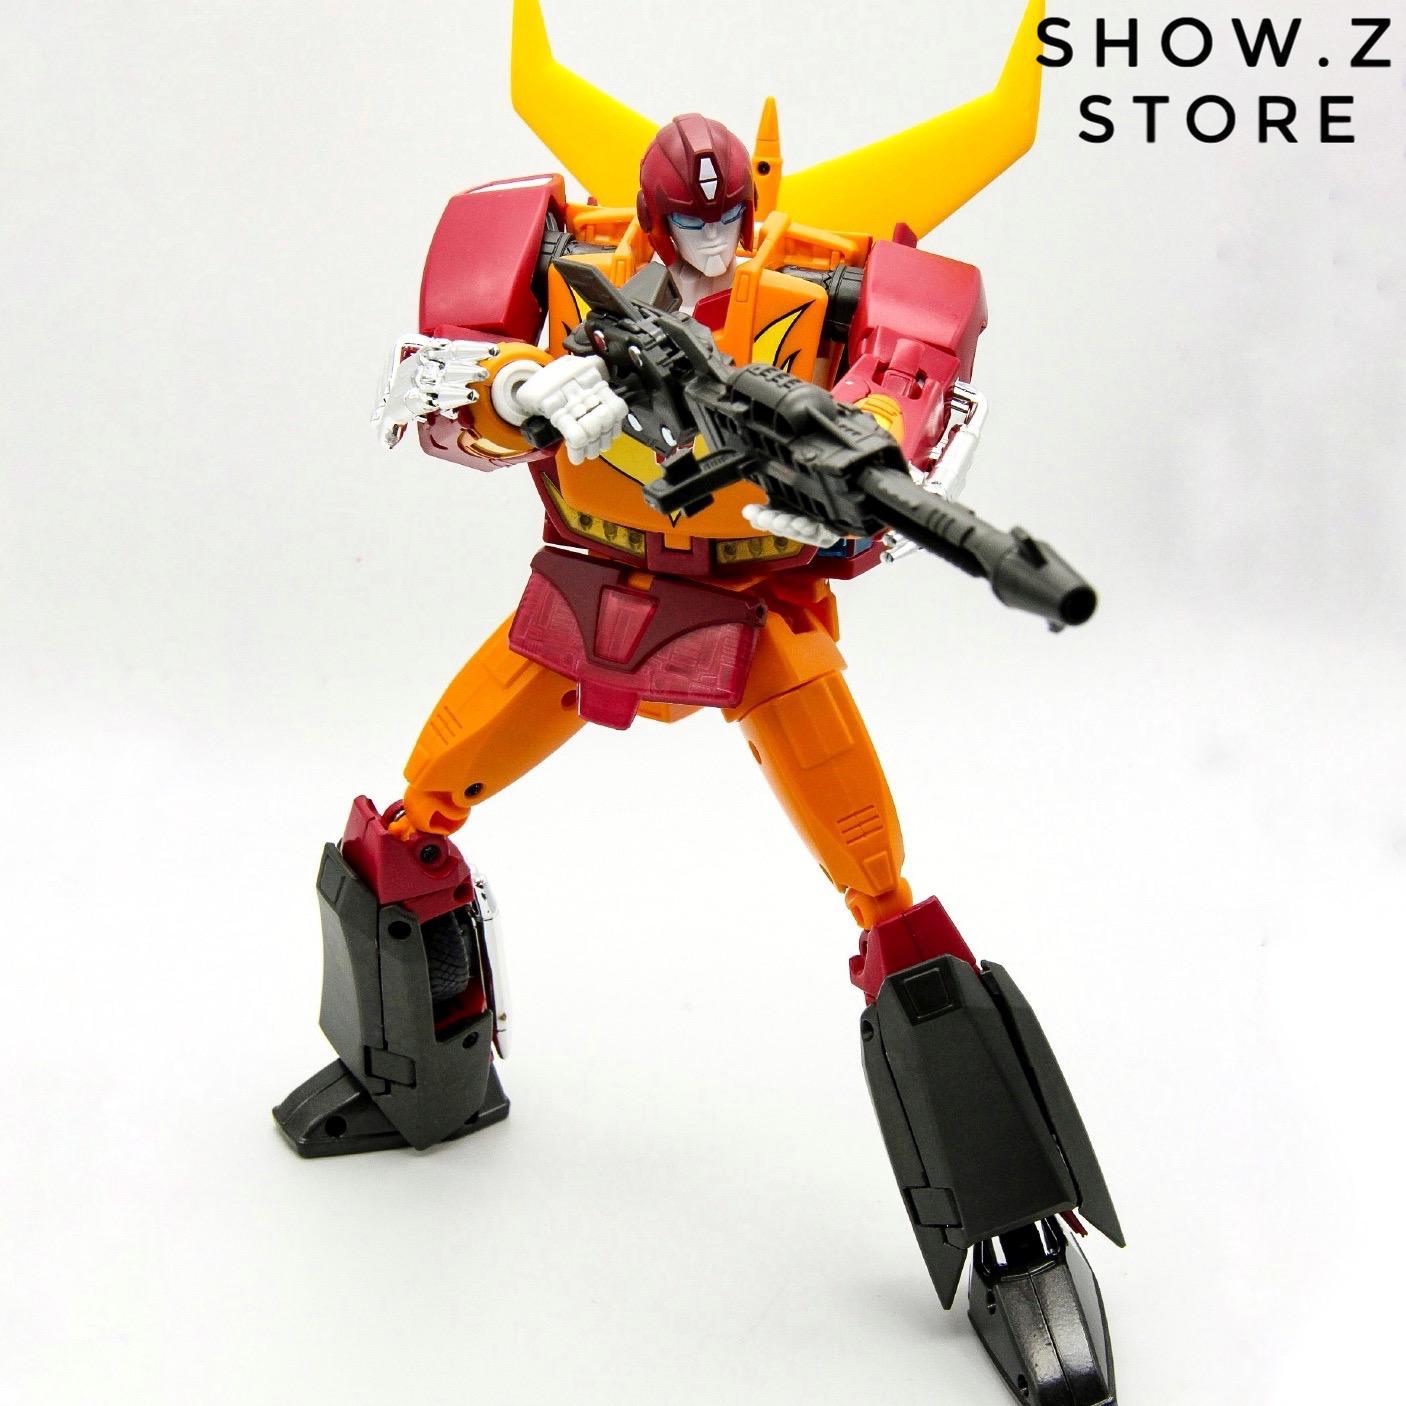 Takara Tomy Transformers Masterpiece MP-09 Rodimus Prime 2018 re-release version